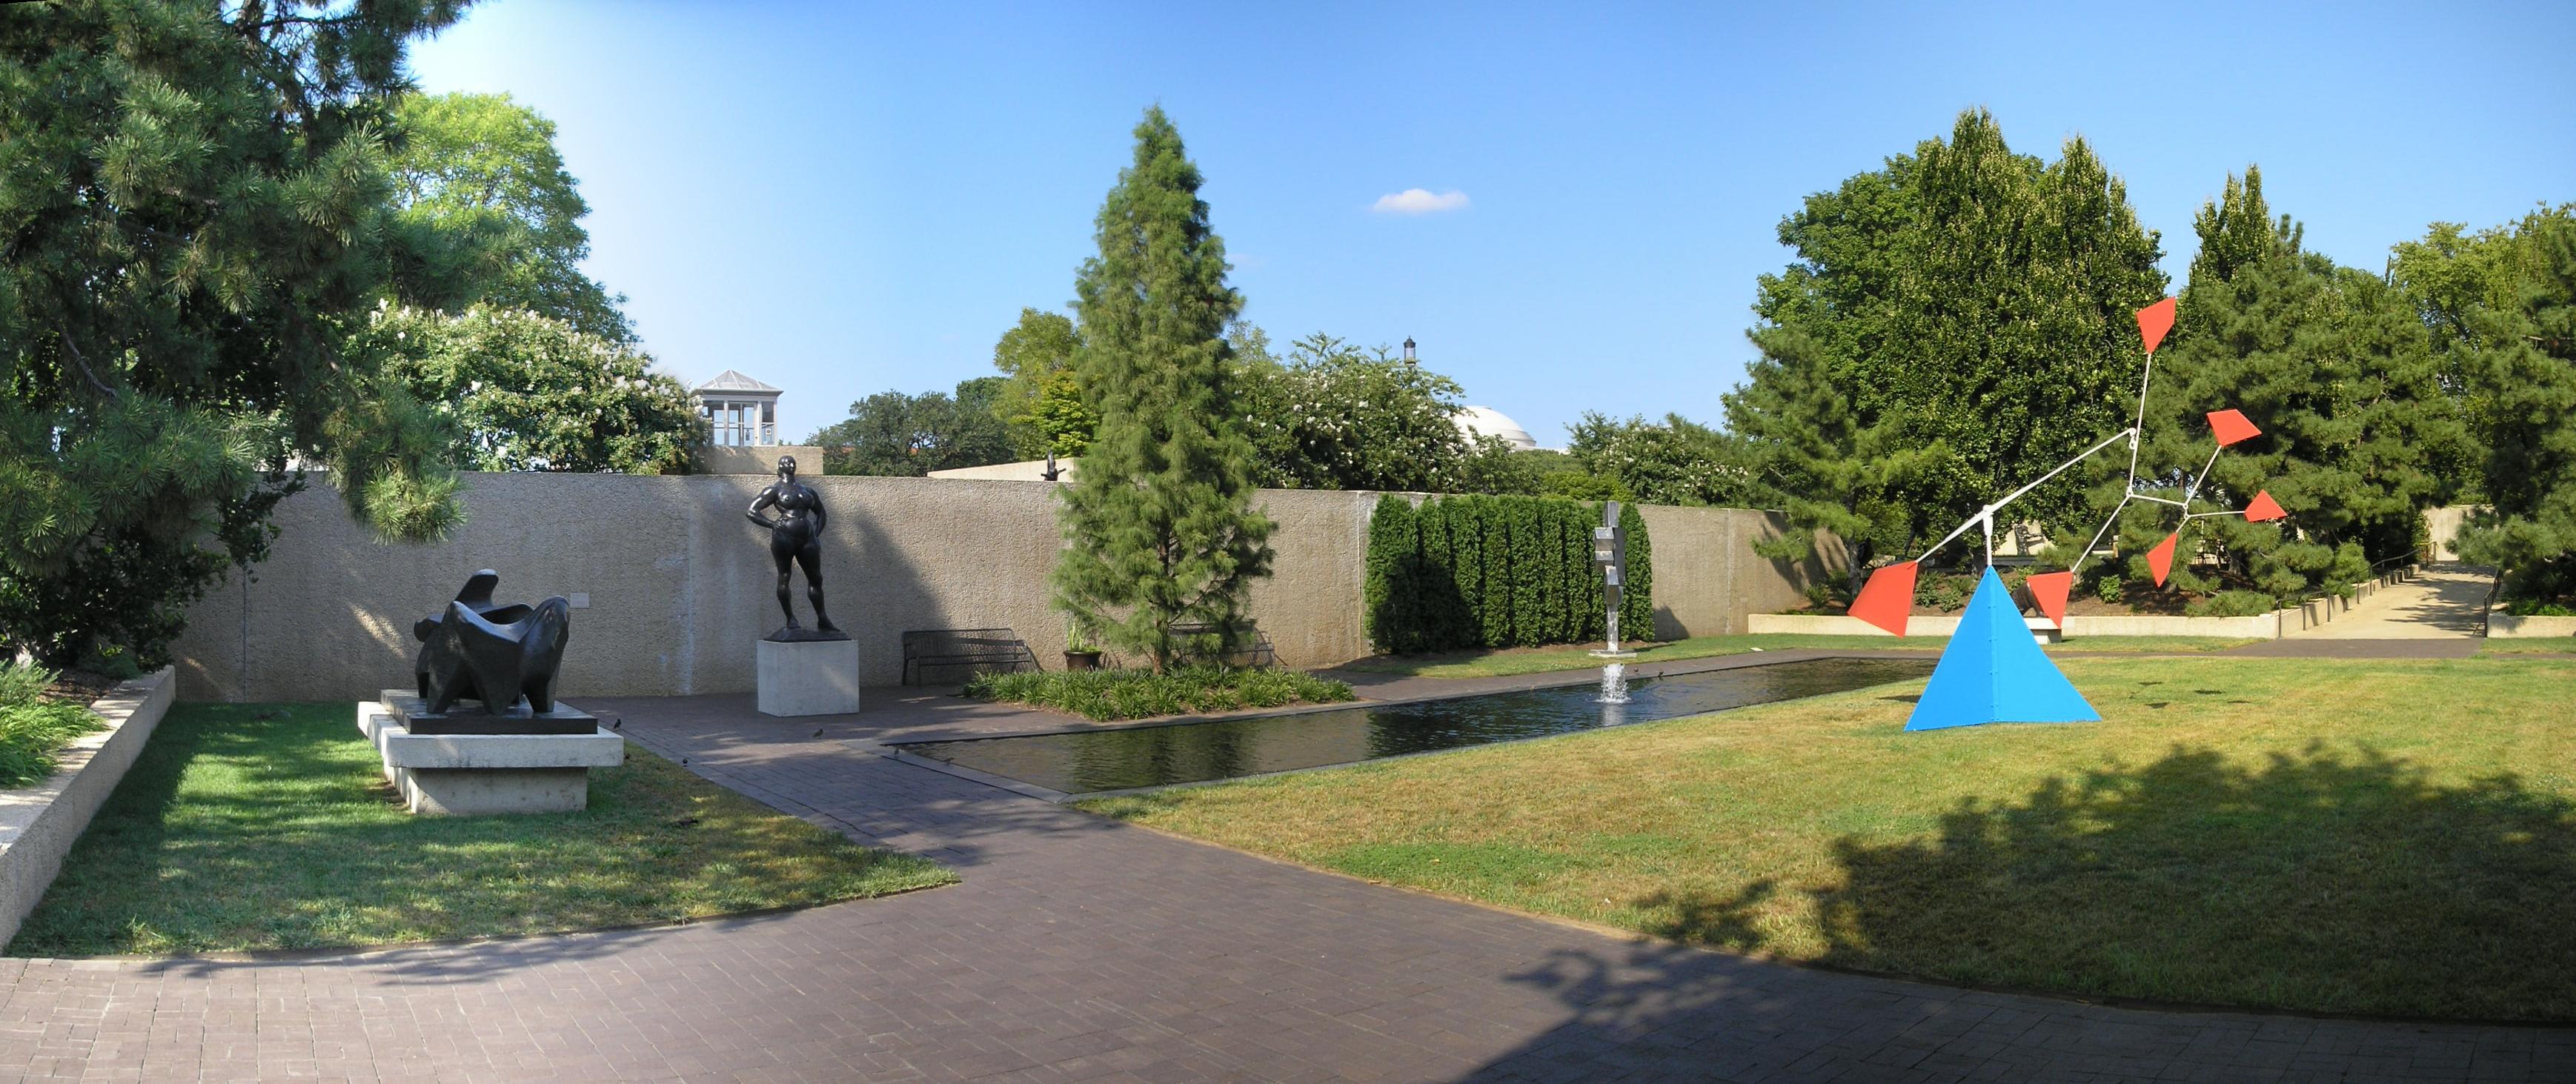 take a walk through hirshhorn museum and sculpture garden in washington d c photos places